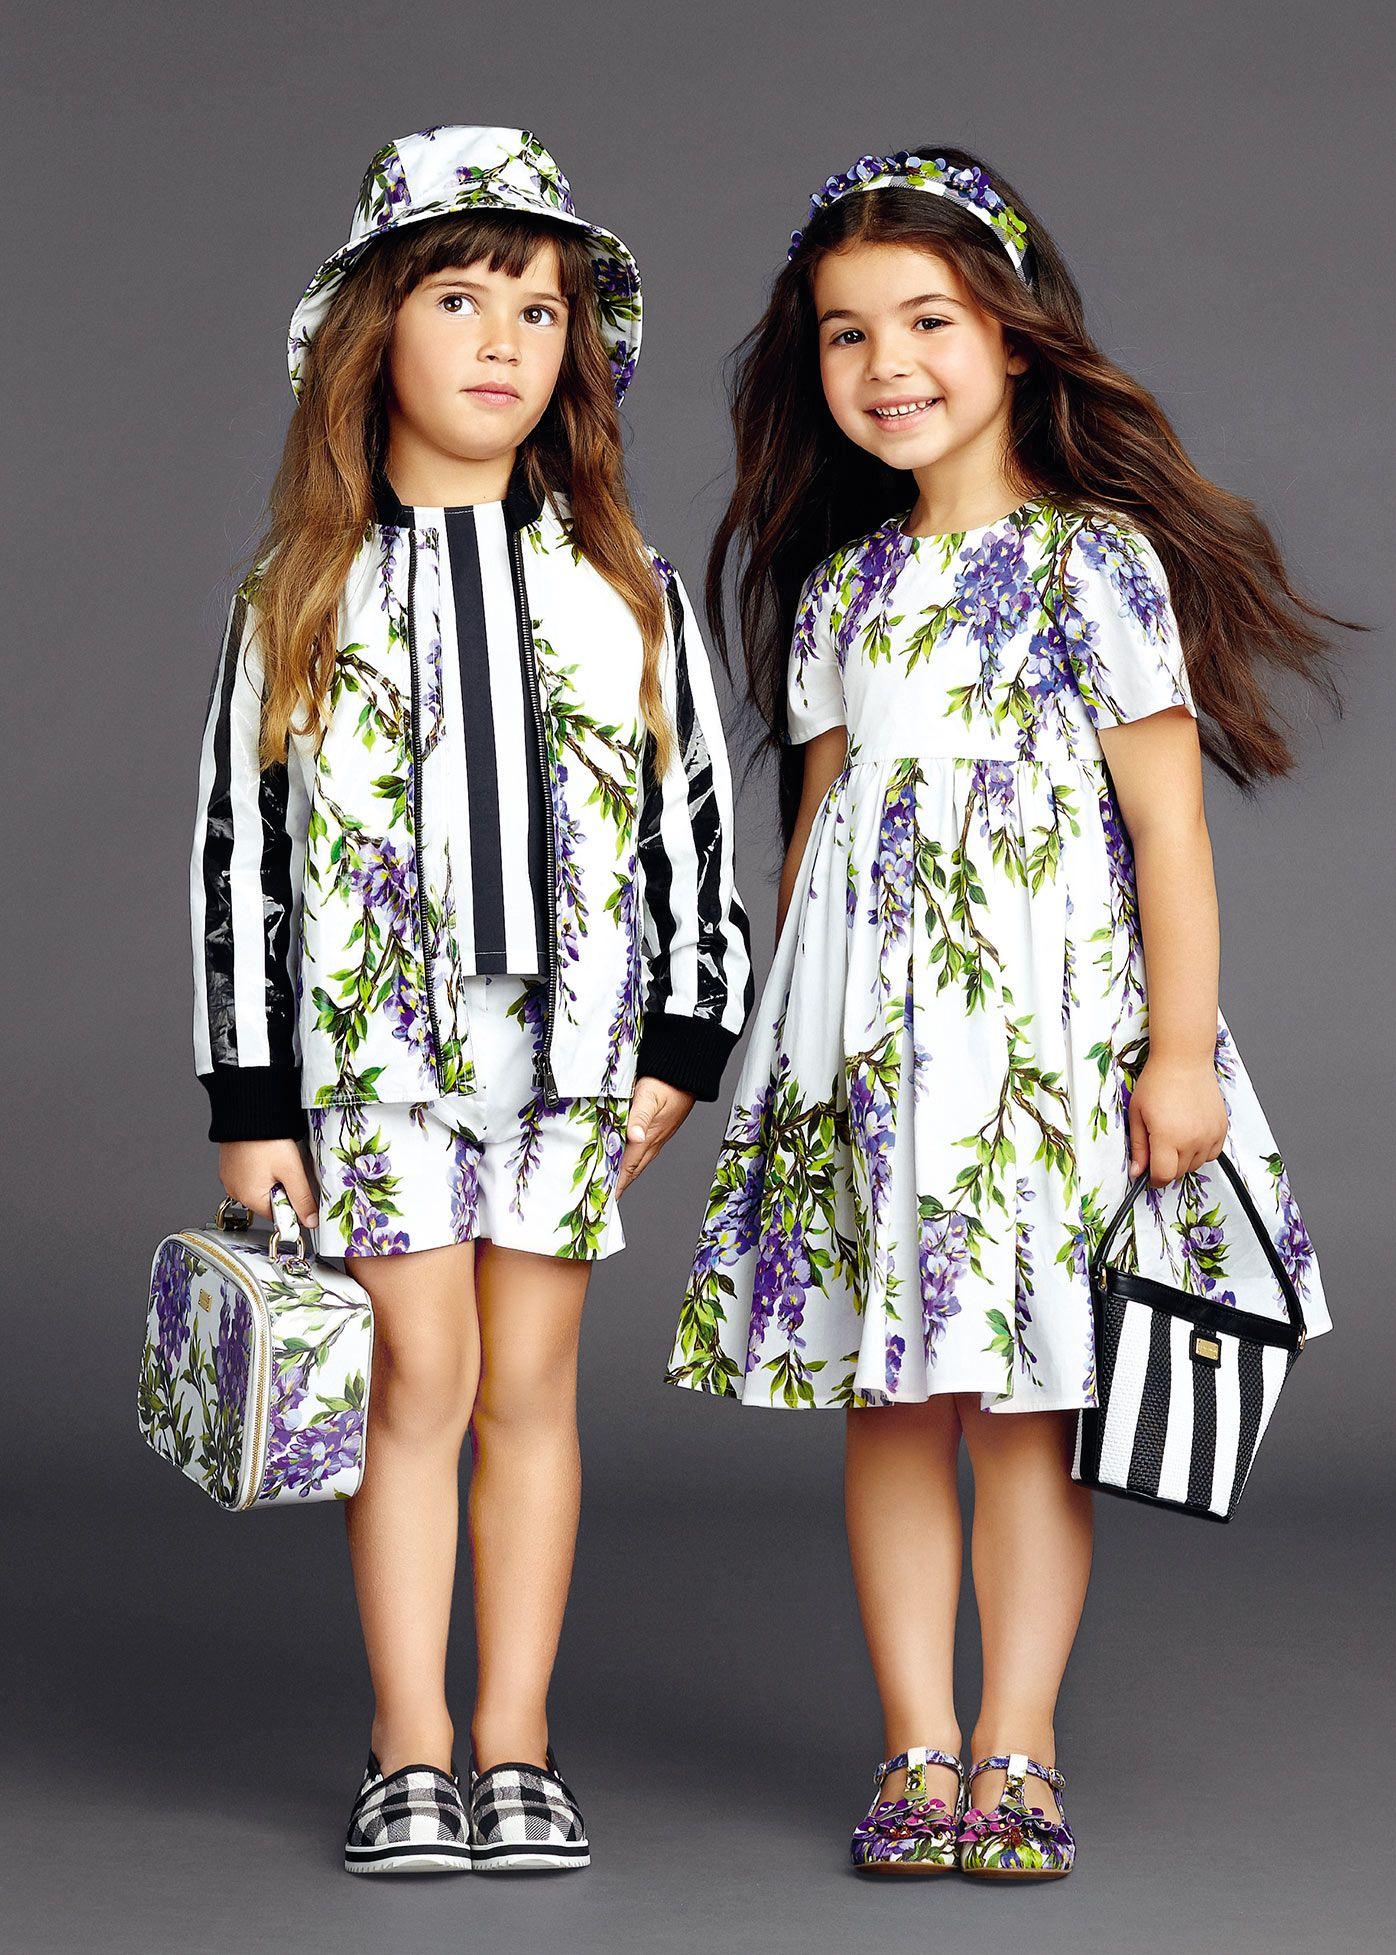 7a53dbb01 Dolce & Gabbana Children Summer Collection 2015   Crianças   Kids ...